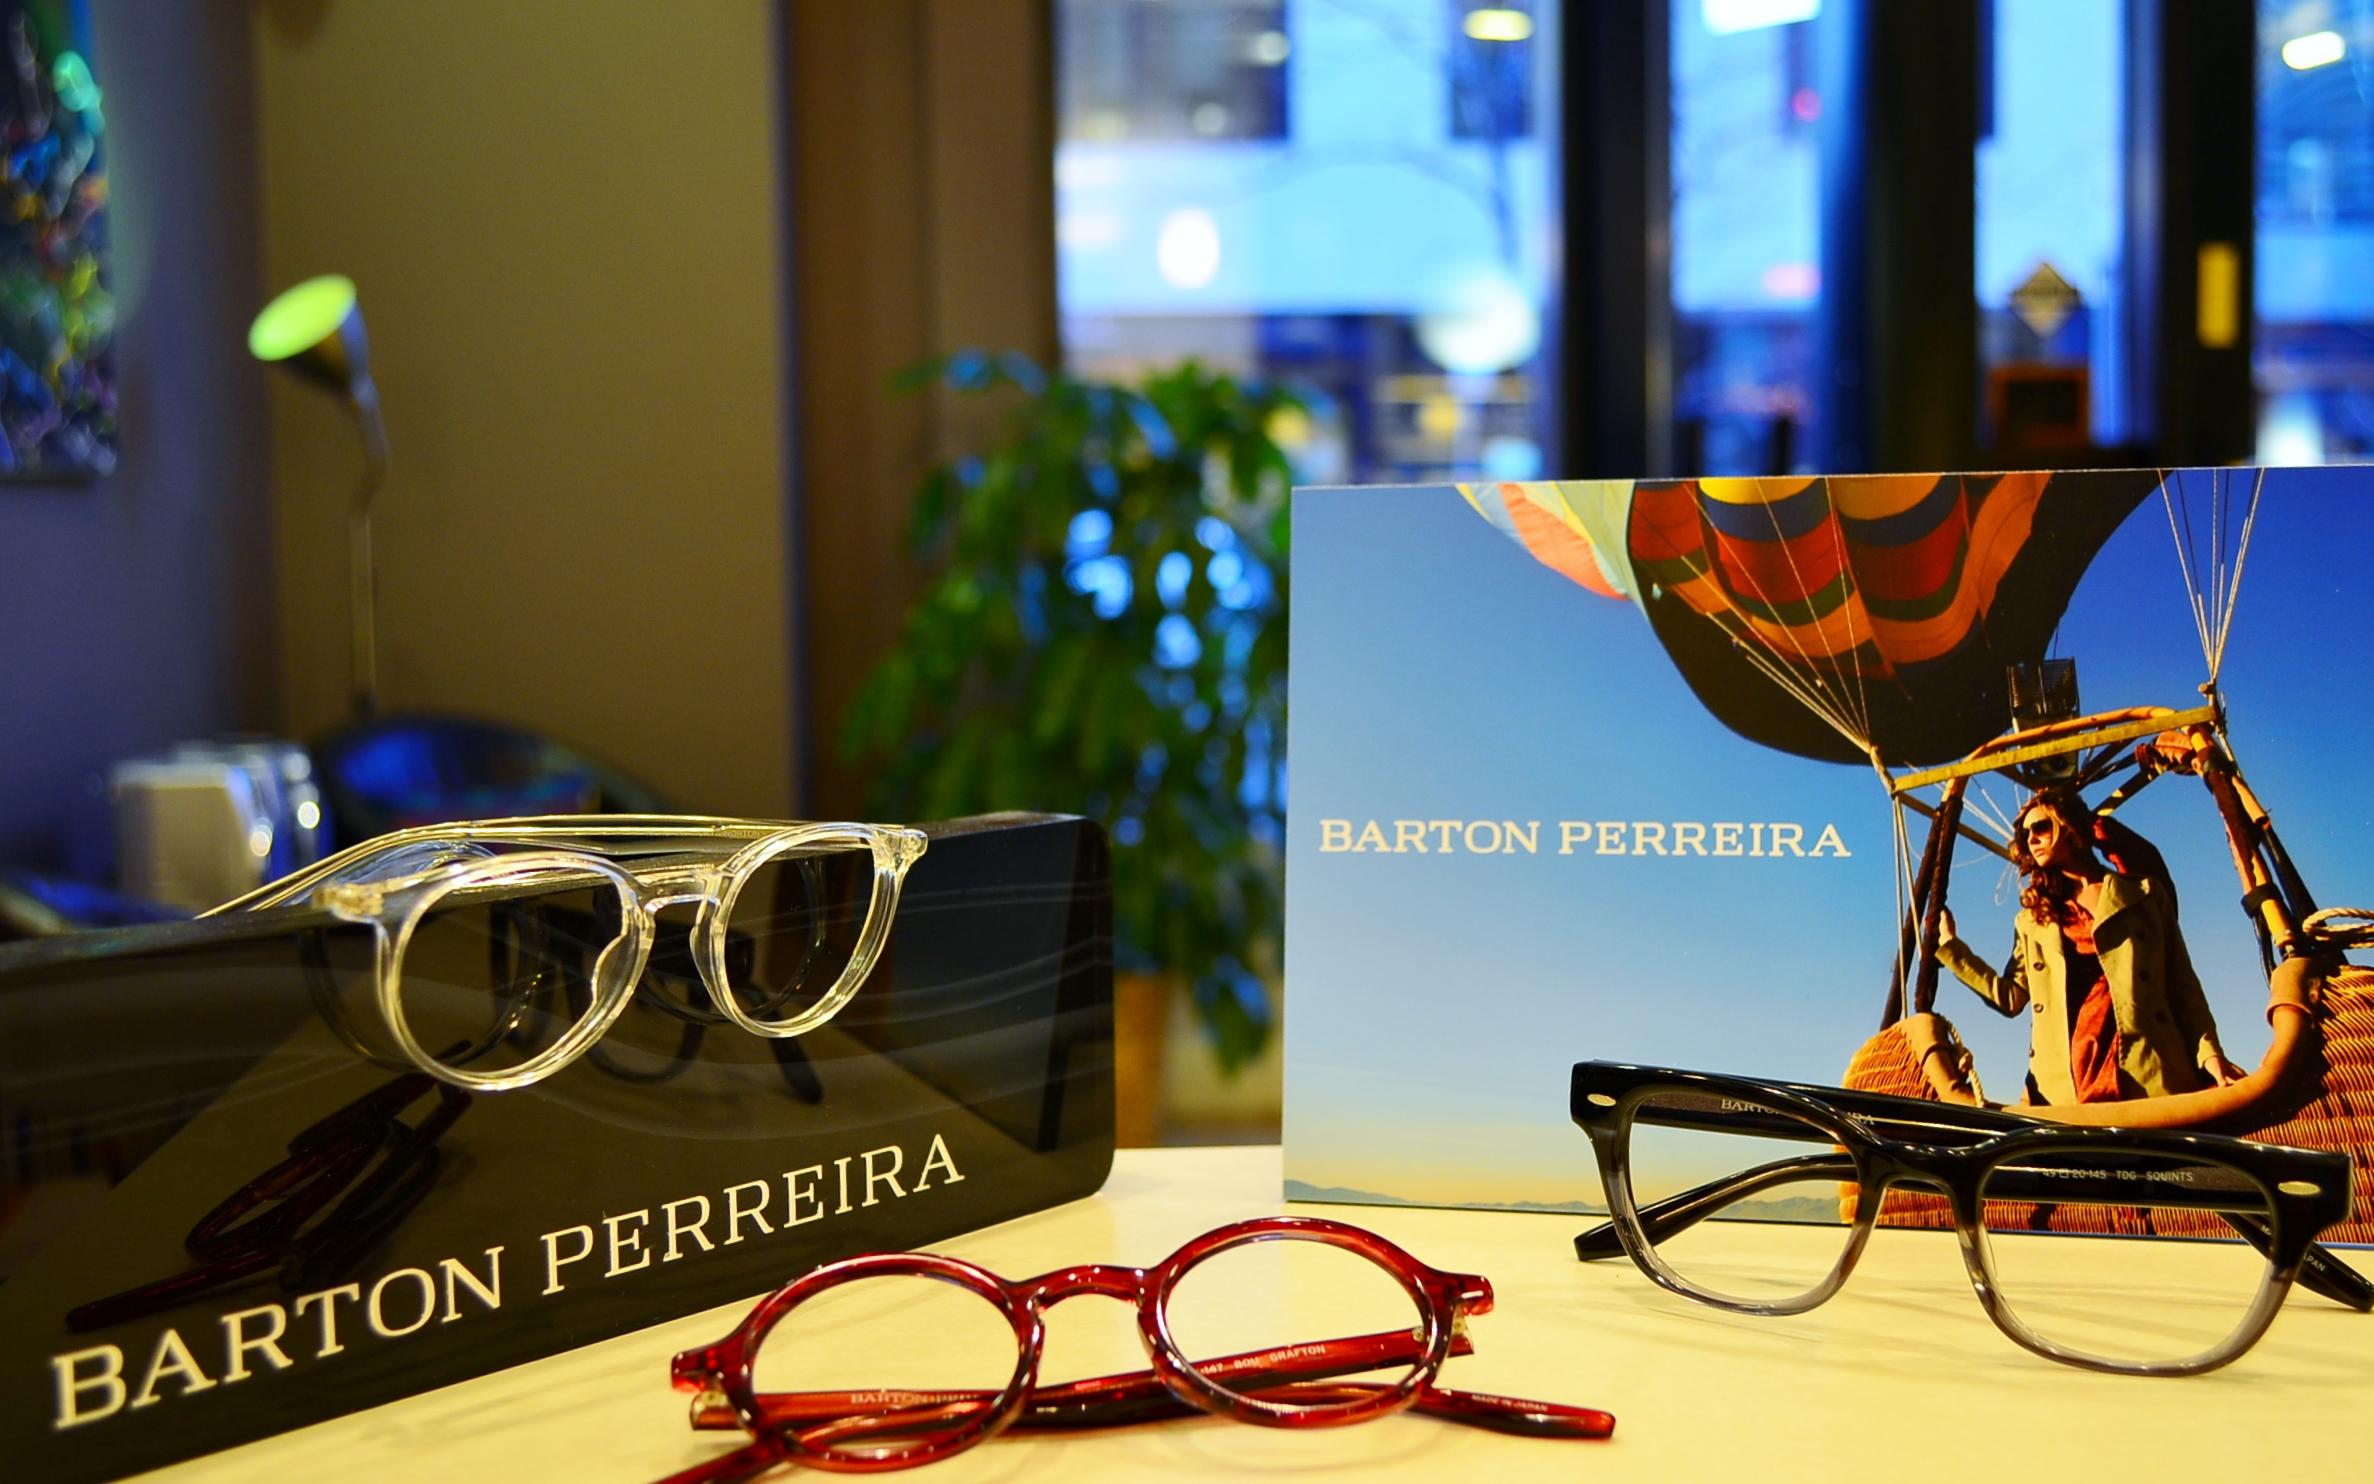 picture of barton perreira eyeglasses